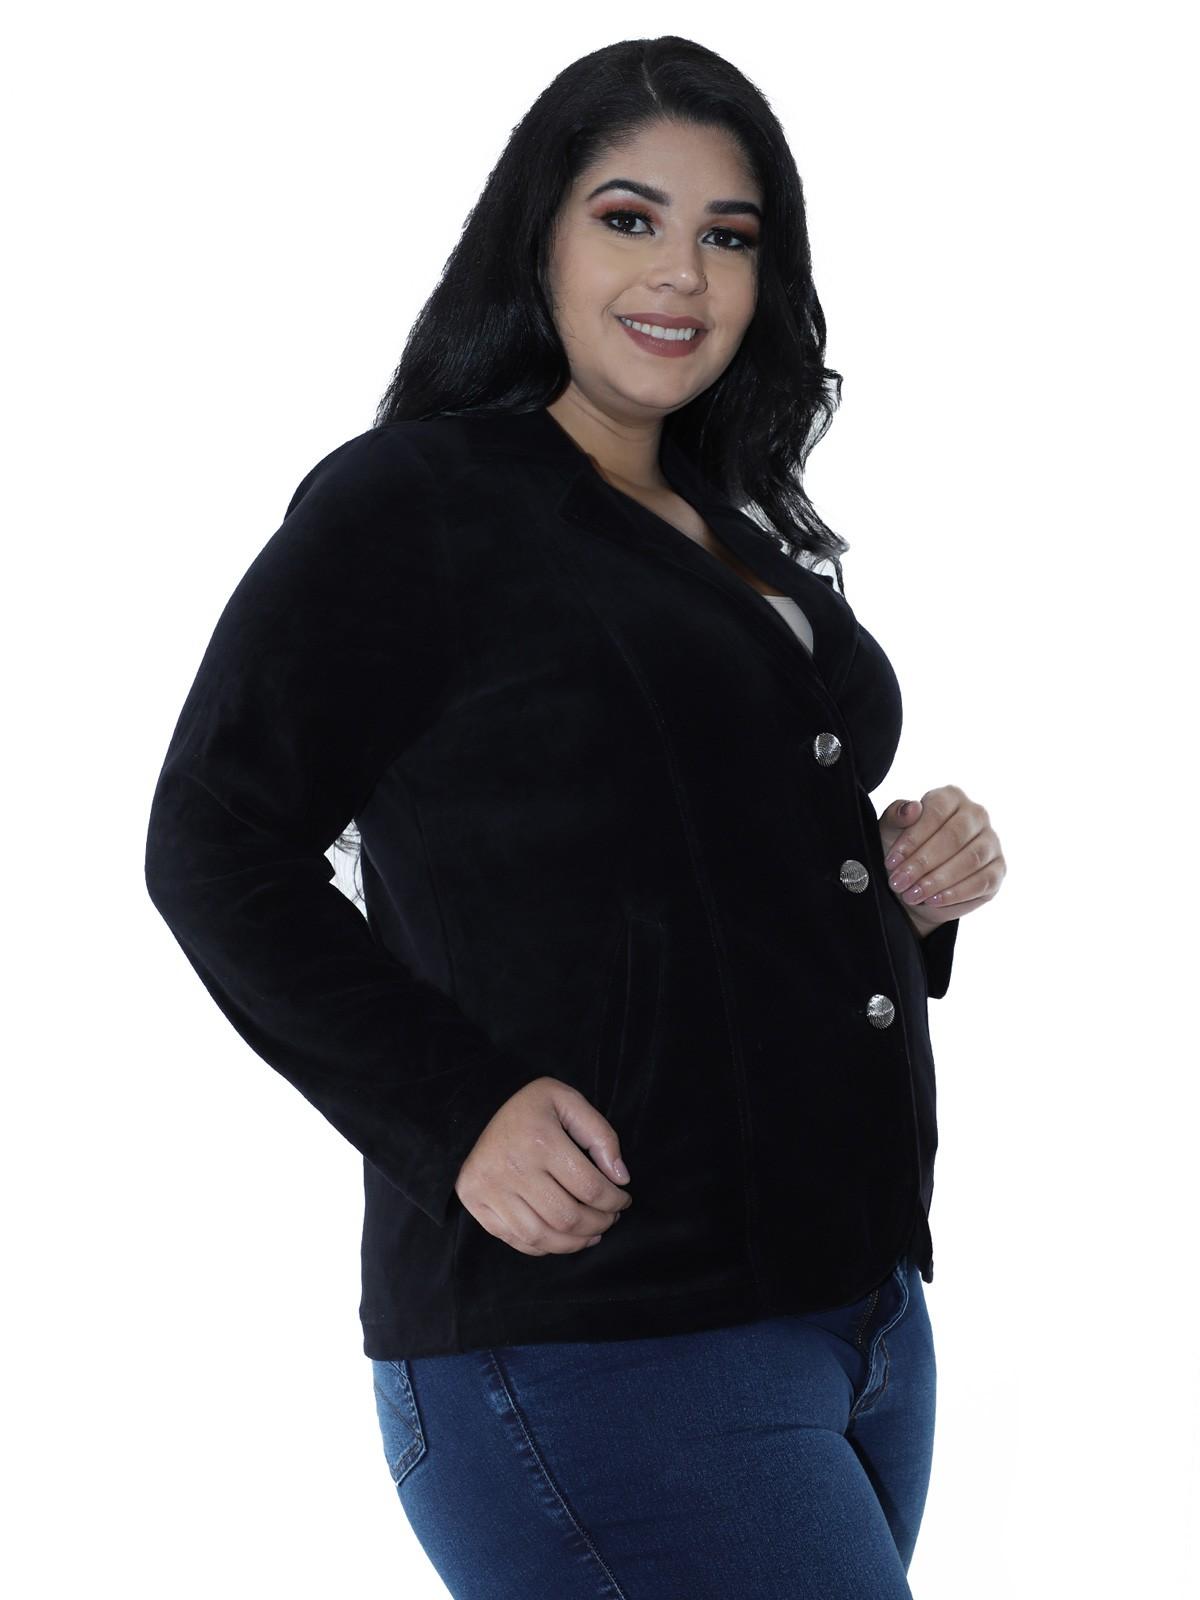 Casaco Plus Size Feminino de Plush Preto